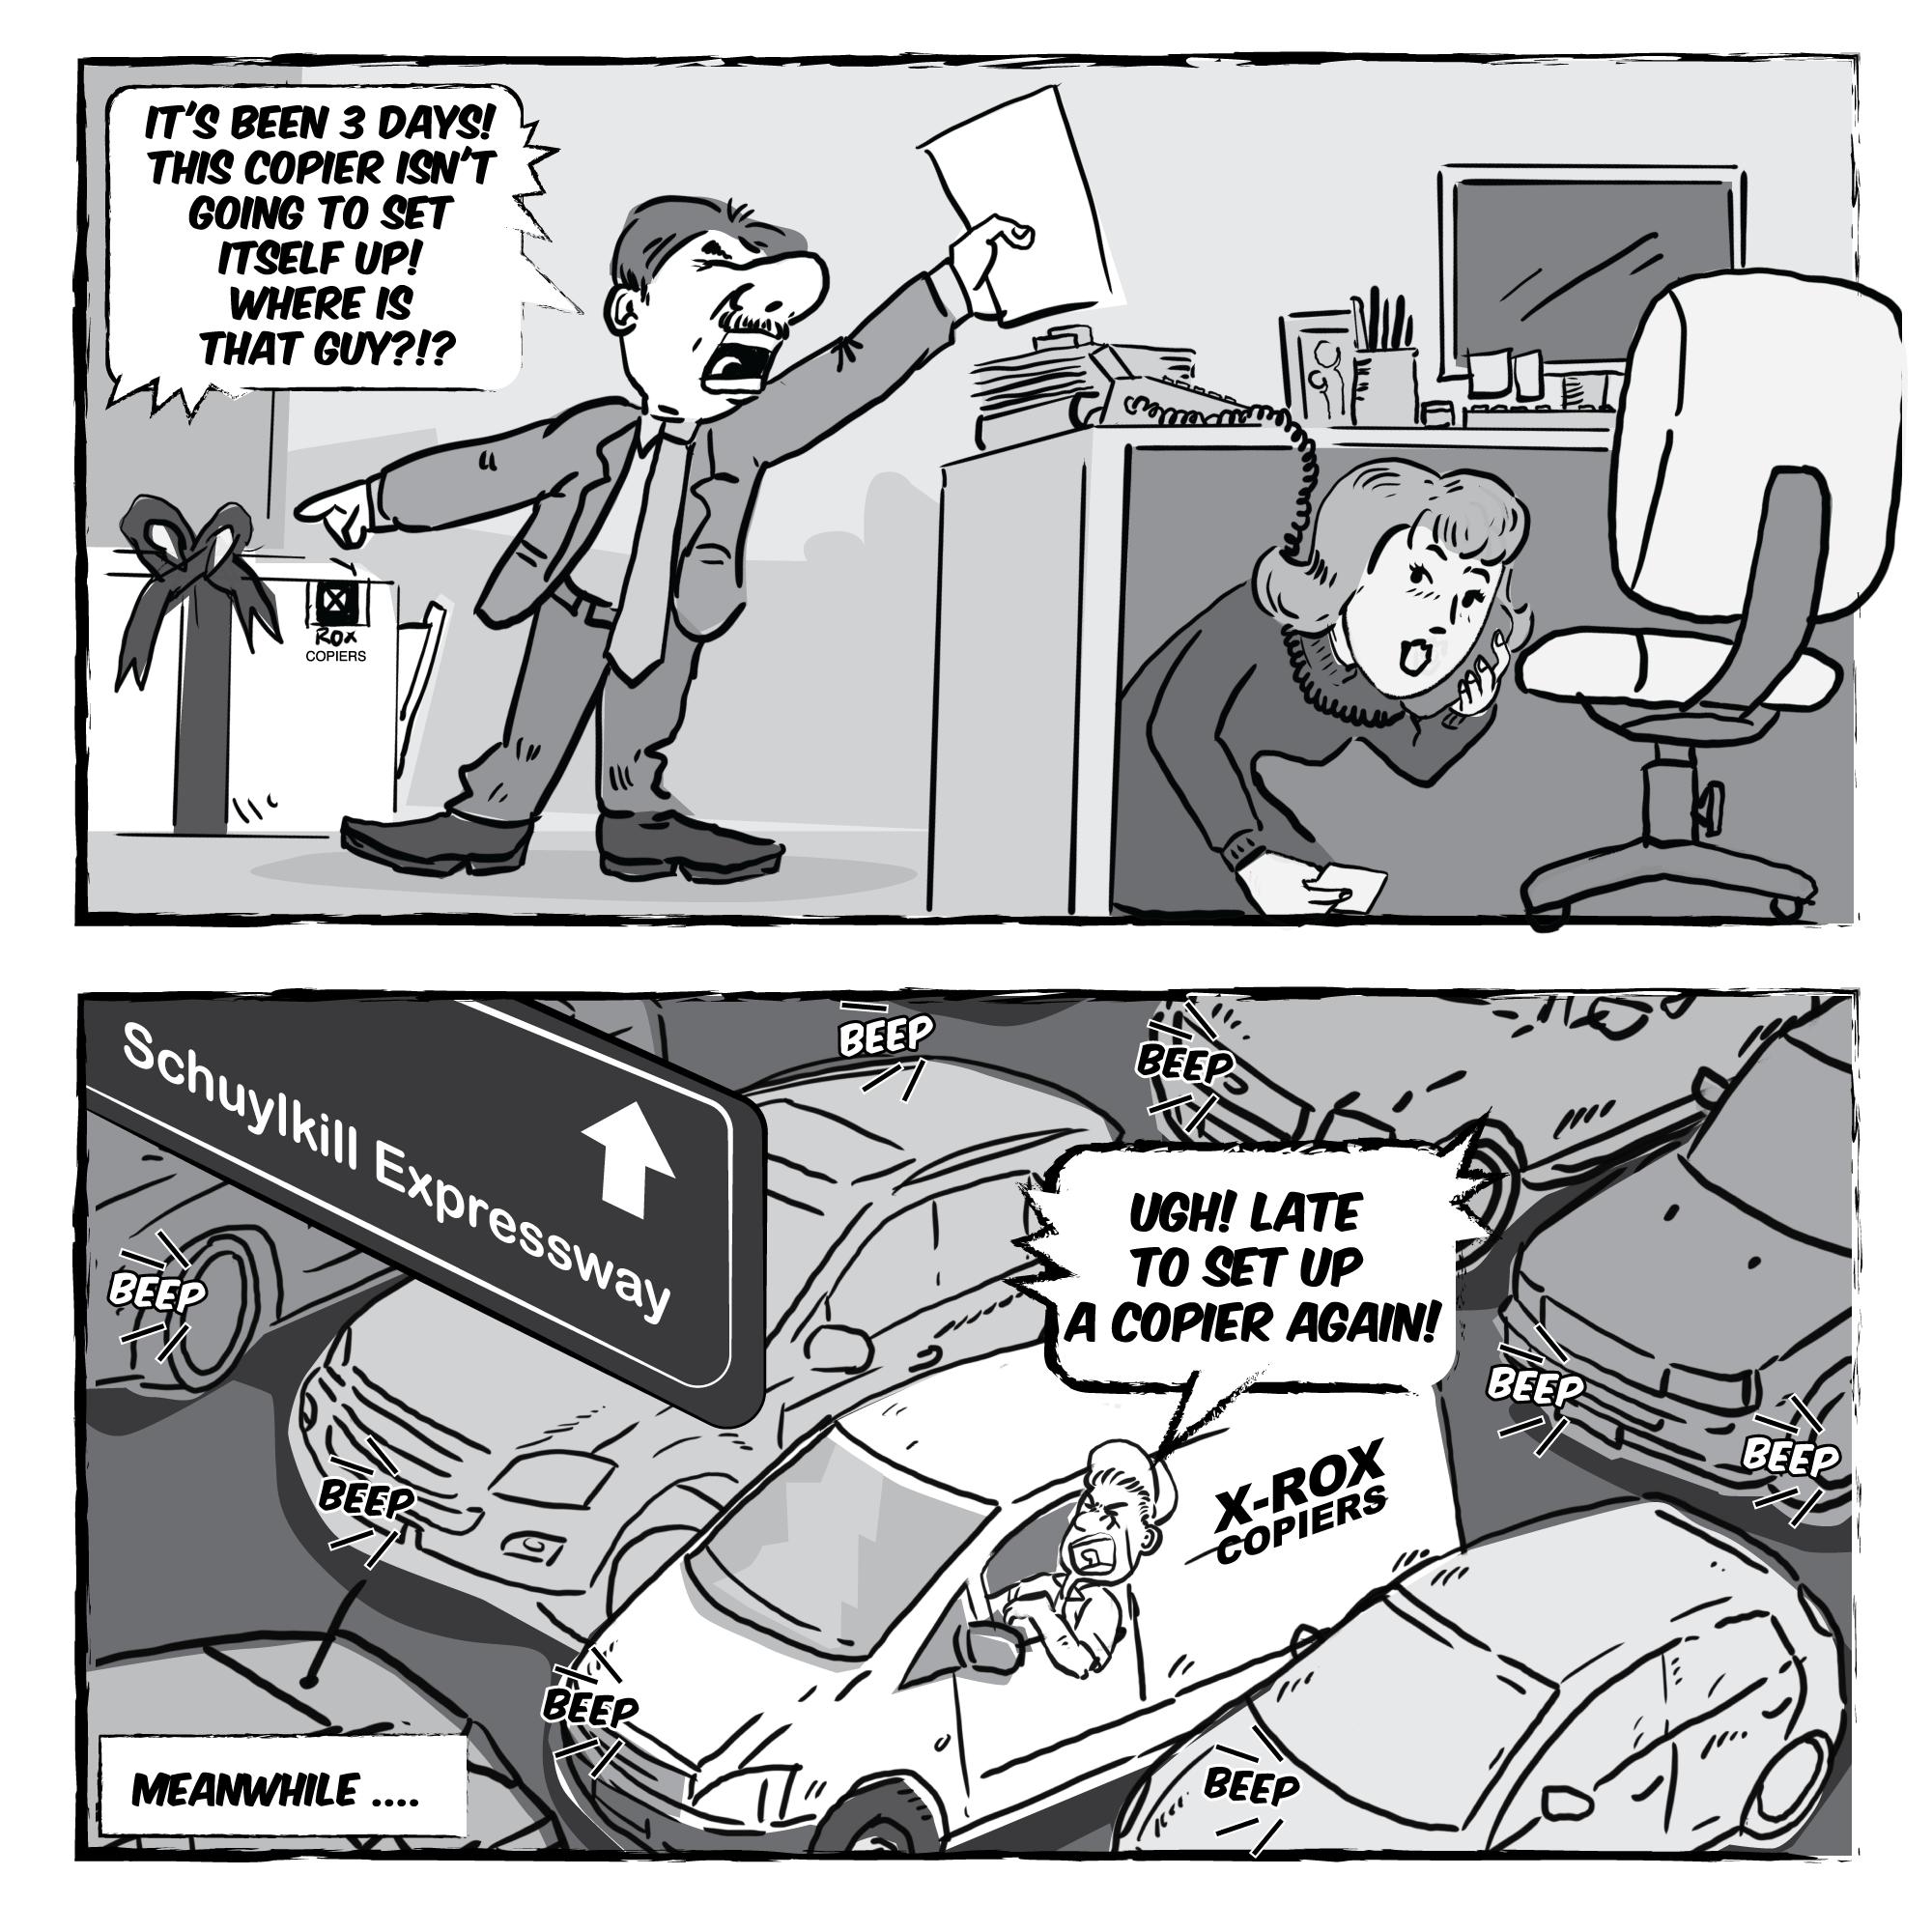 Business Comic/Illustration